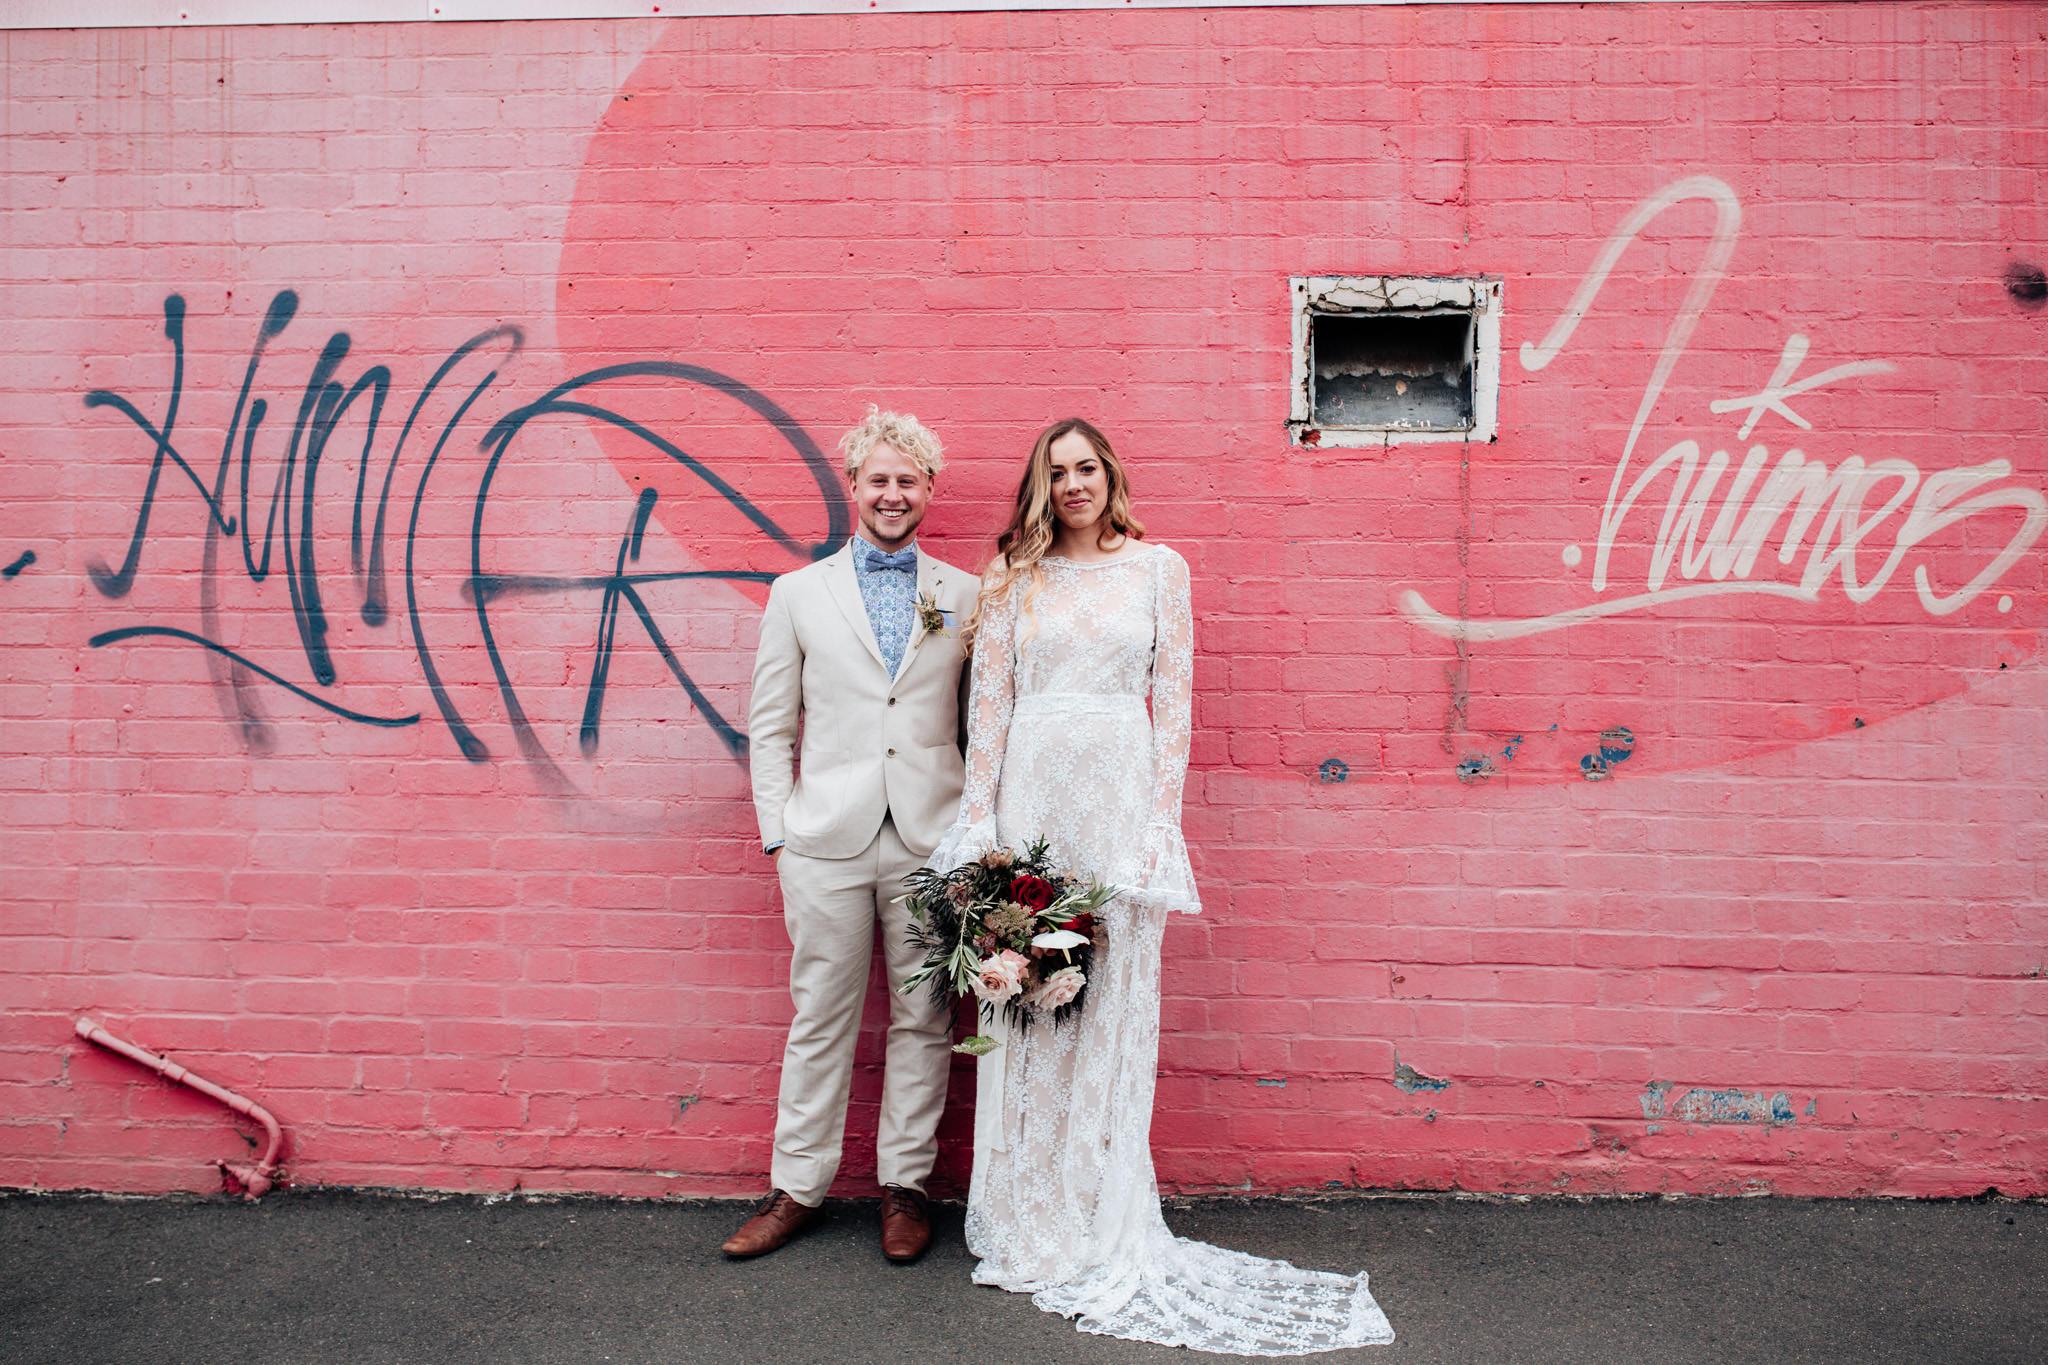 Aster and Rose - Wedding Planner and Co-ordinator - Torquay, Geelong, Surfcoast - Summer Wedding-172.jpg